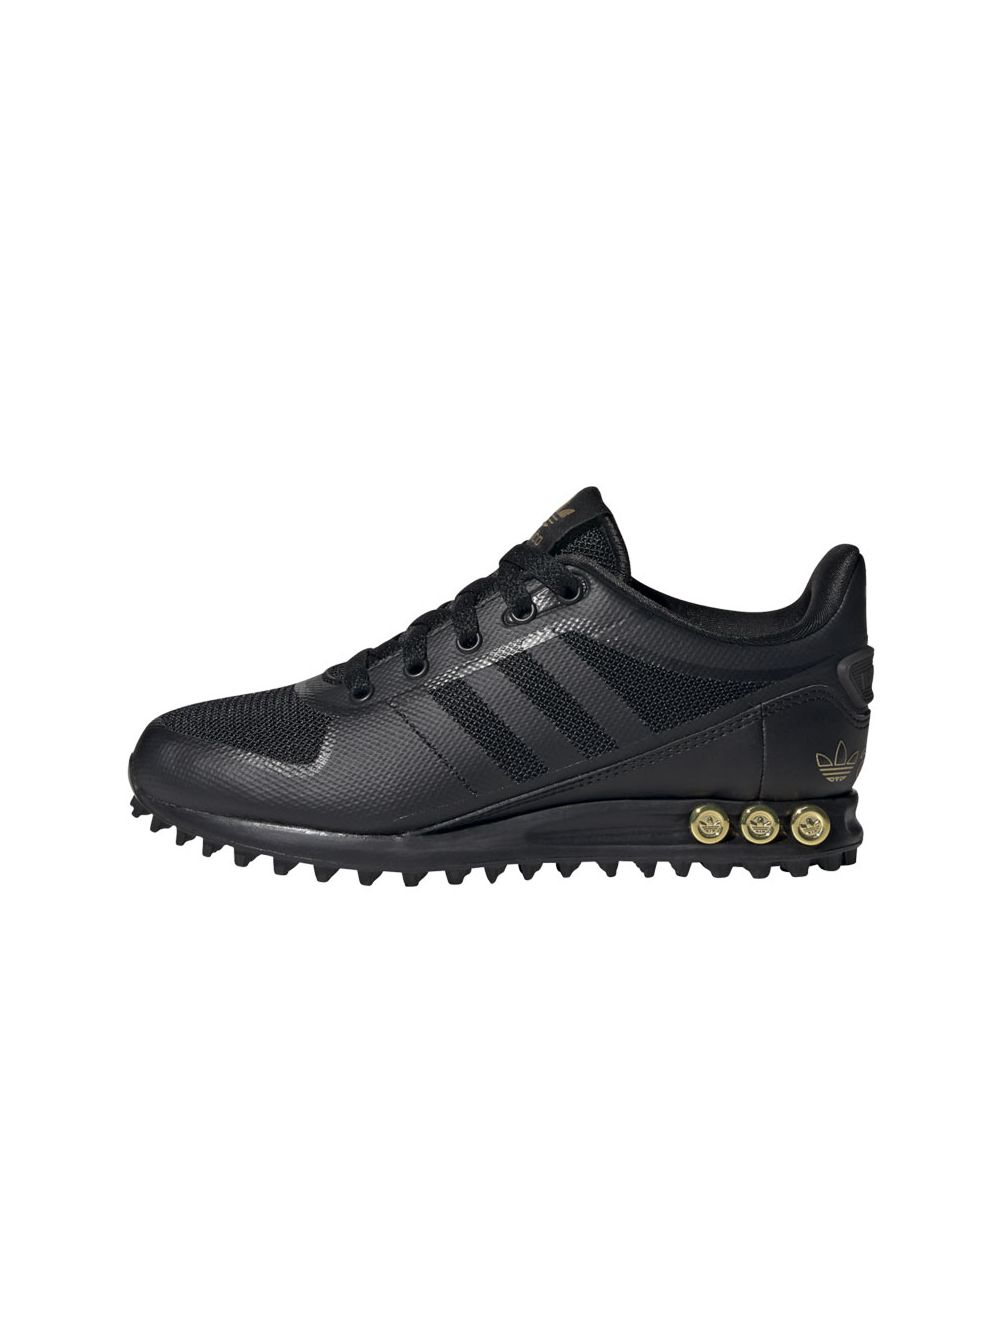 adidas Originals LA Trainer 2 Youth Black